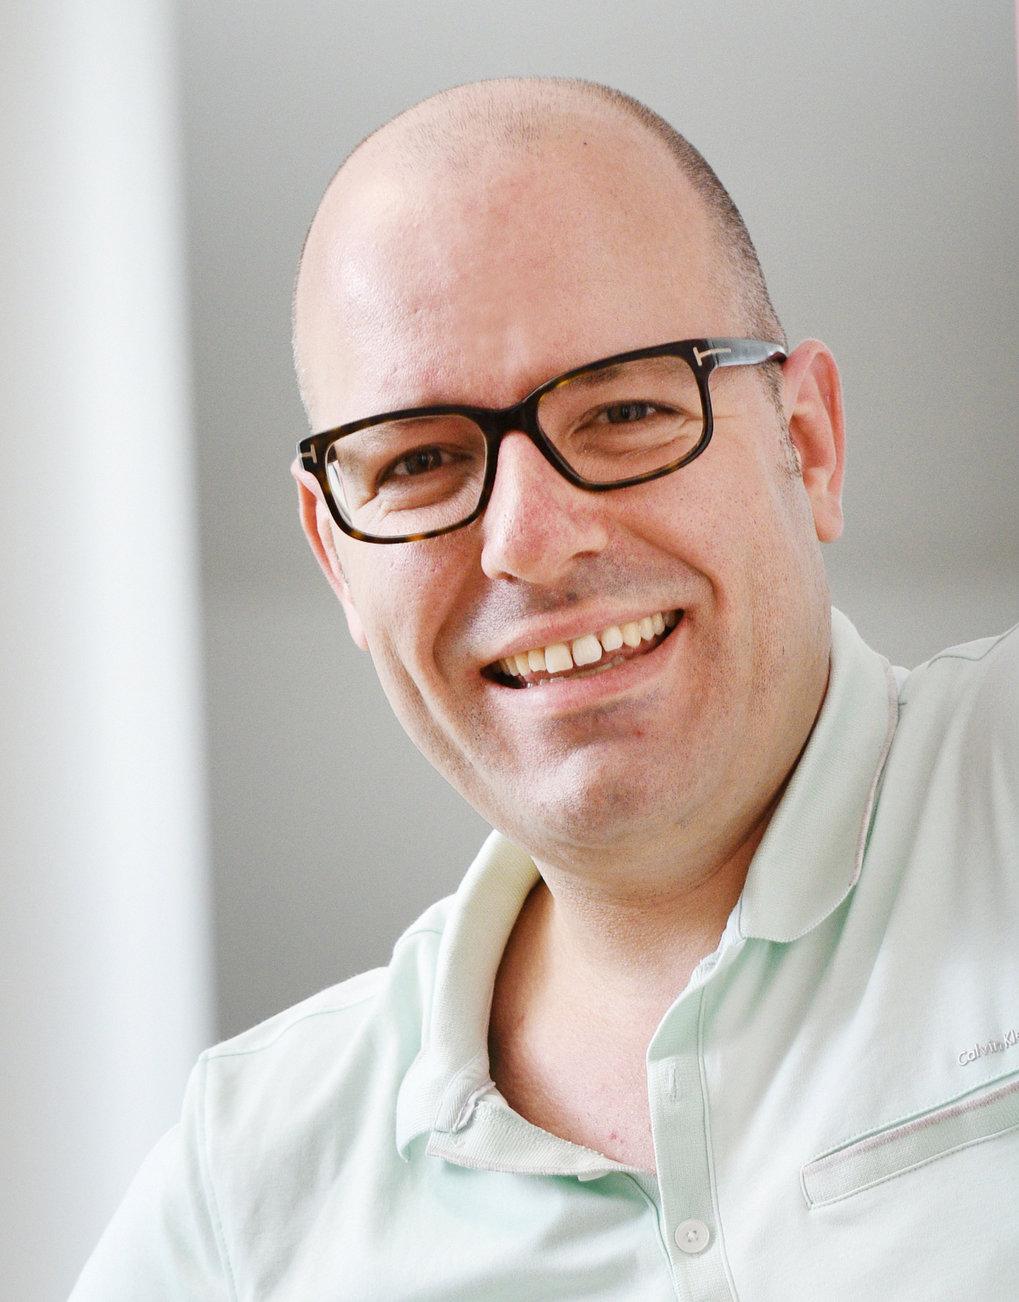 portrait photo of ZMB member Stefan Raunser